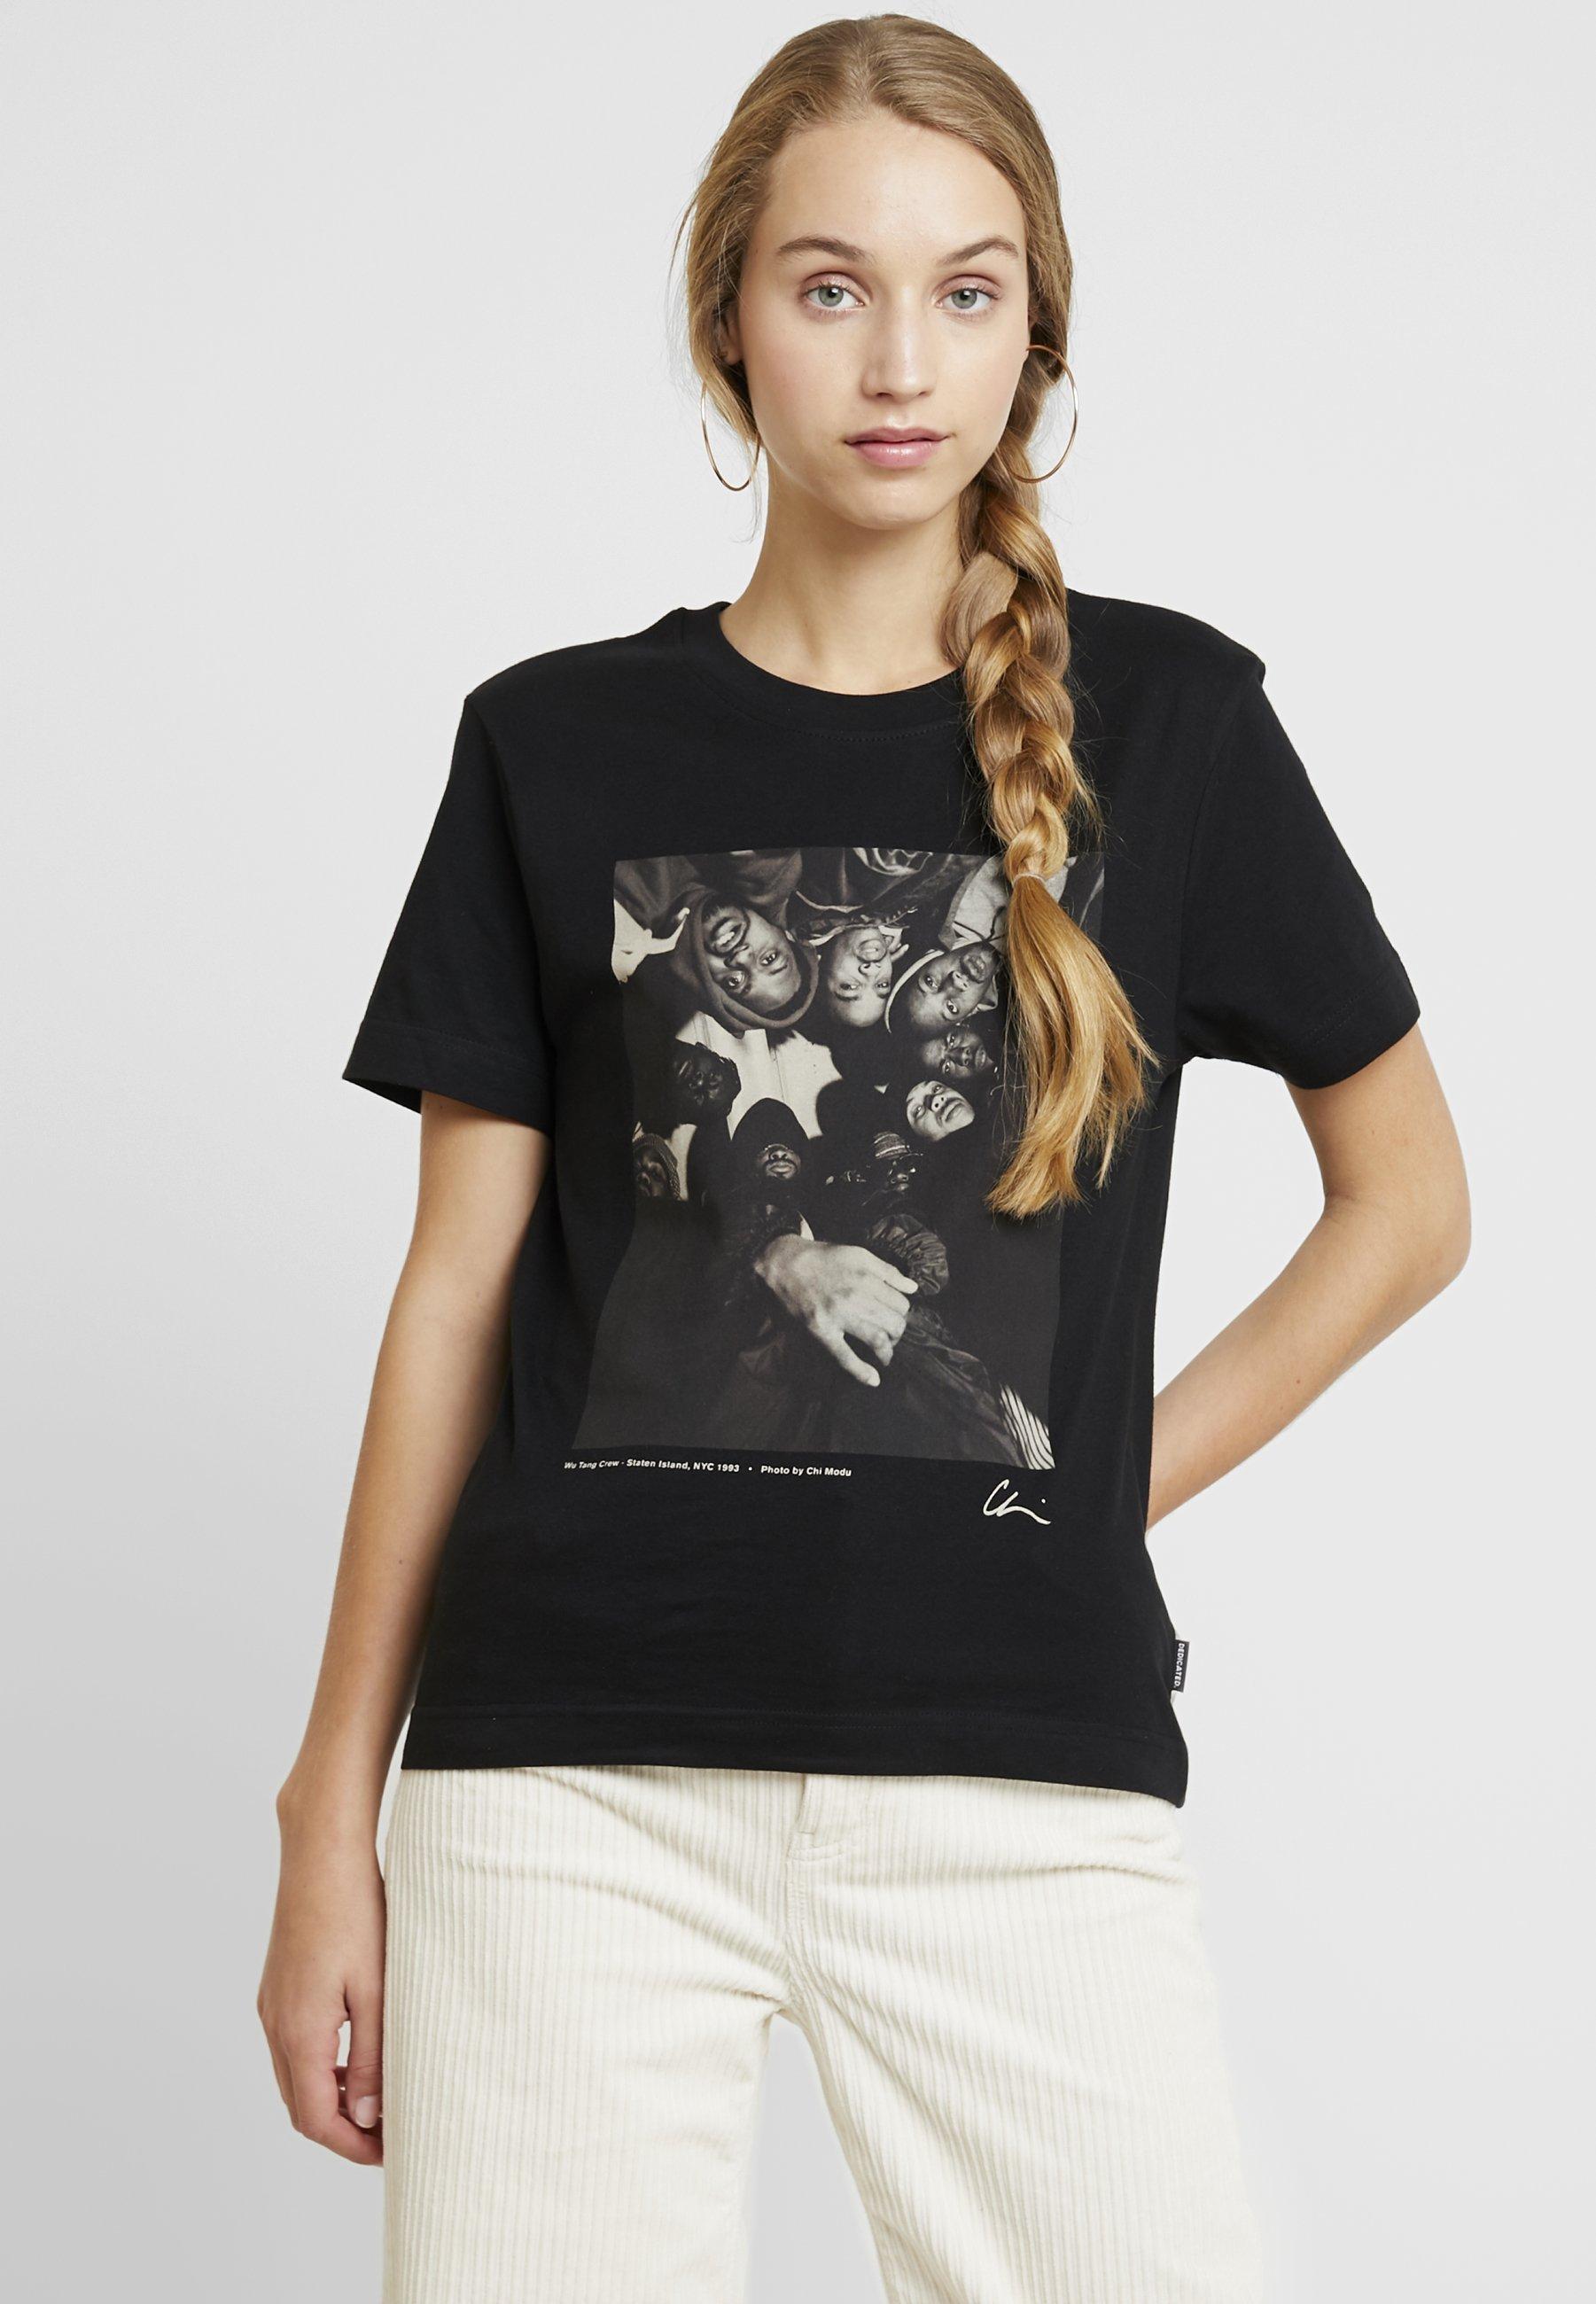 shirt Dedicated Mysen CrewT Imprimé Black ukXZPi